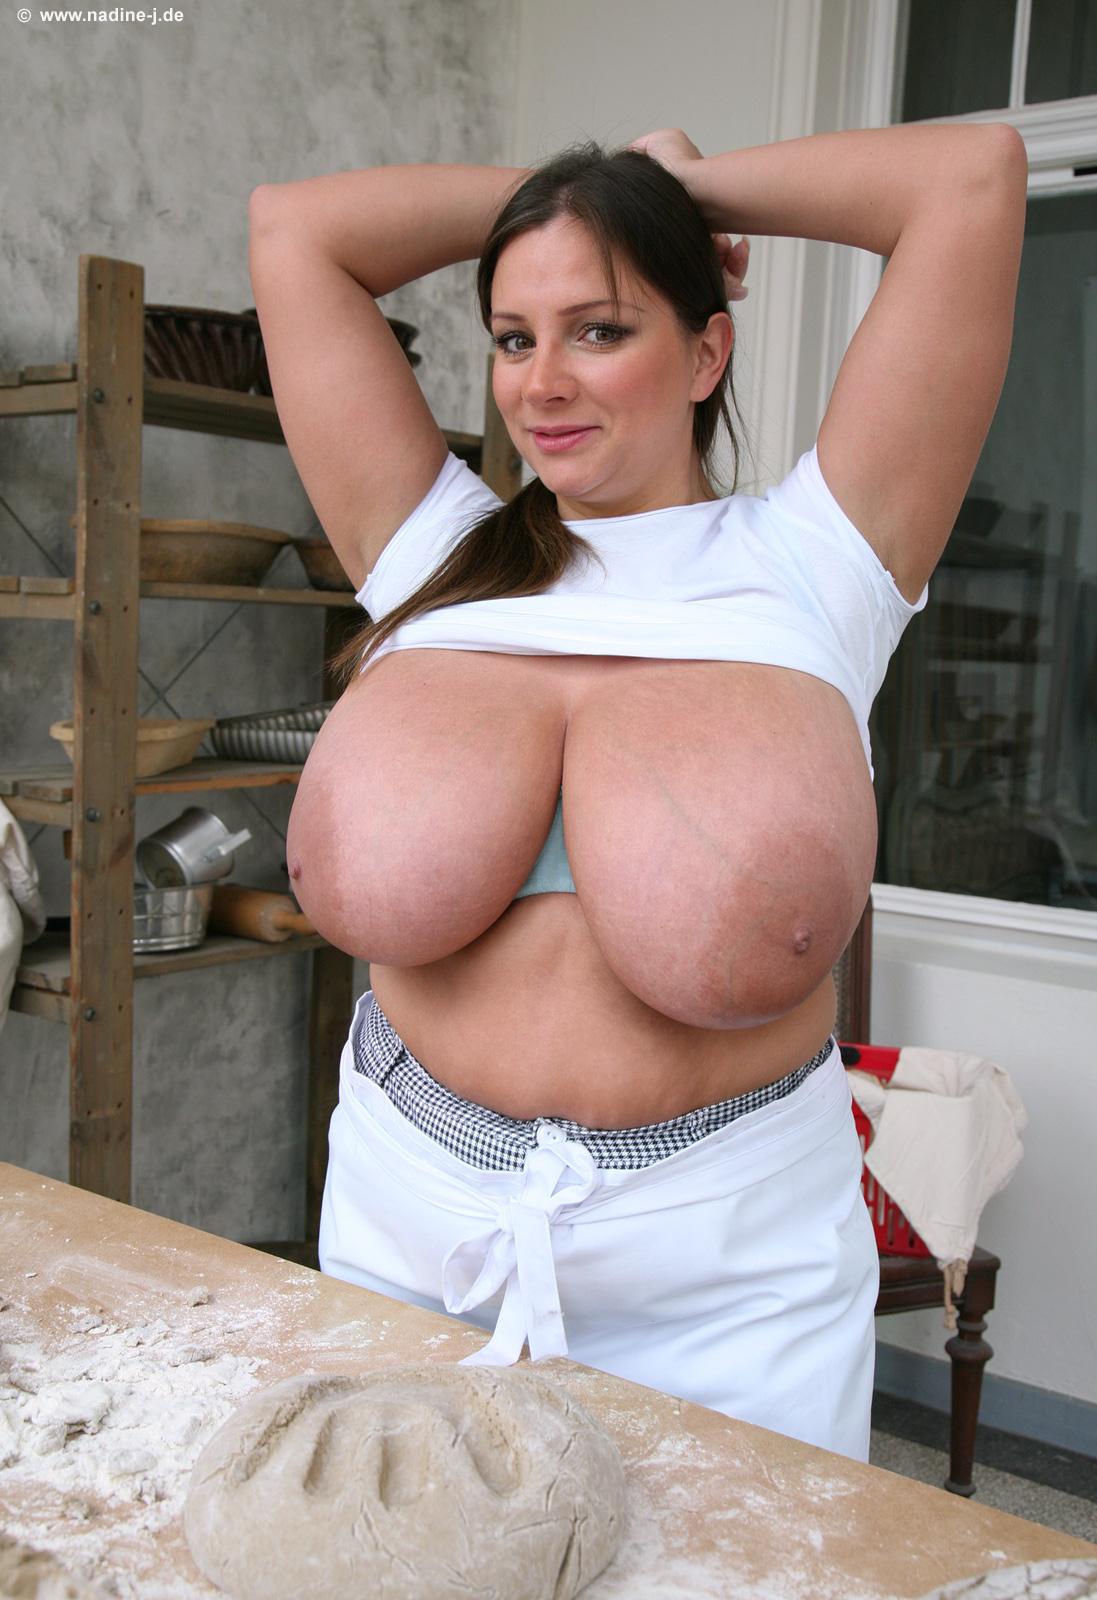 amazing tits 2